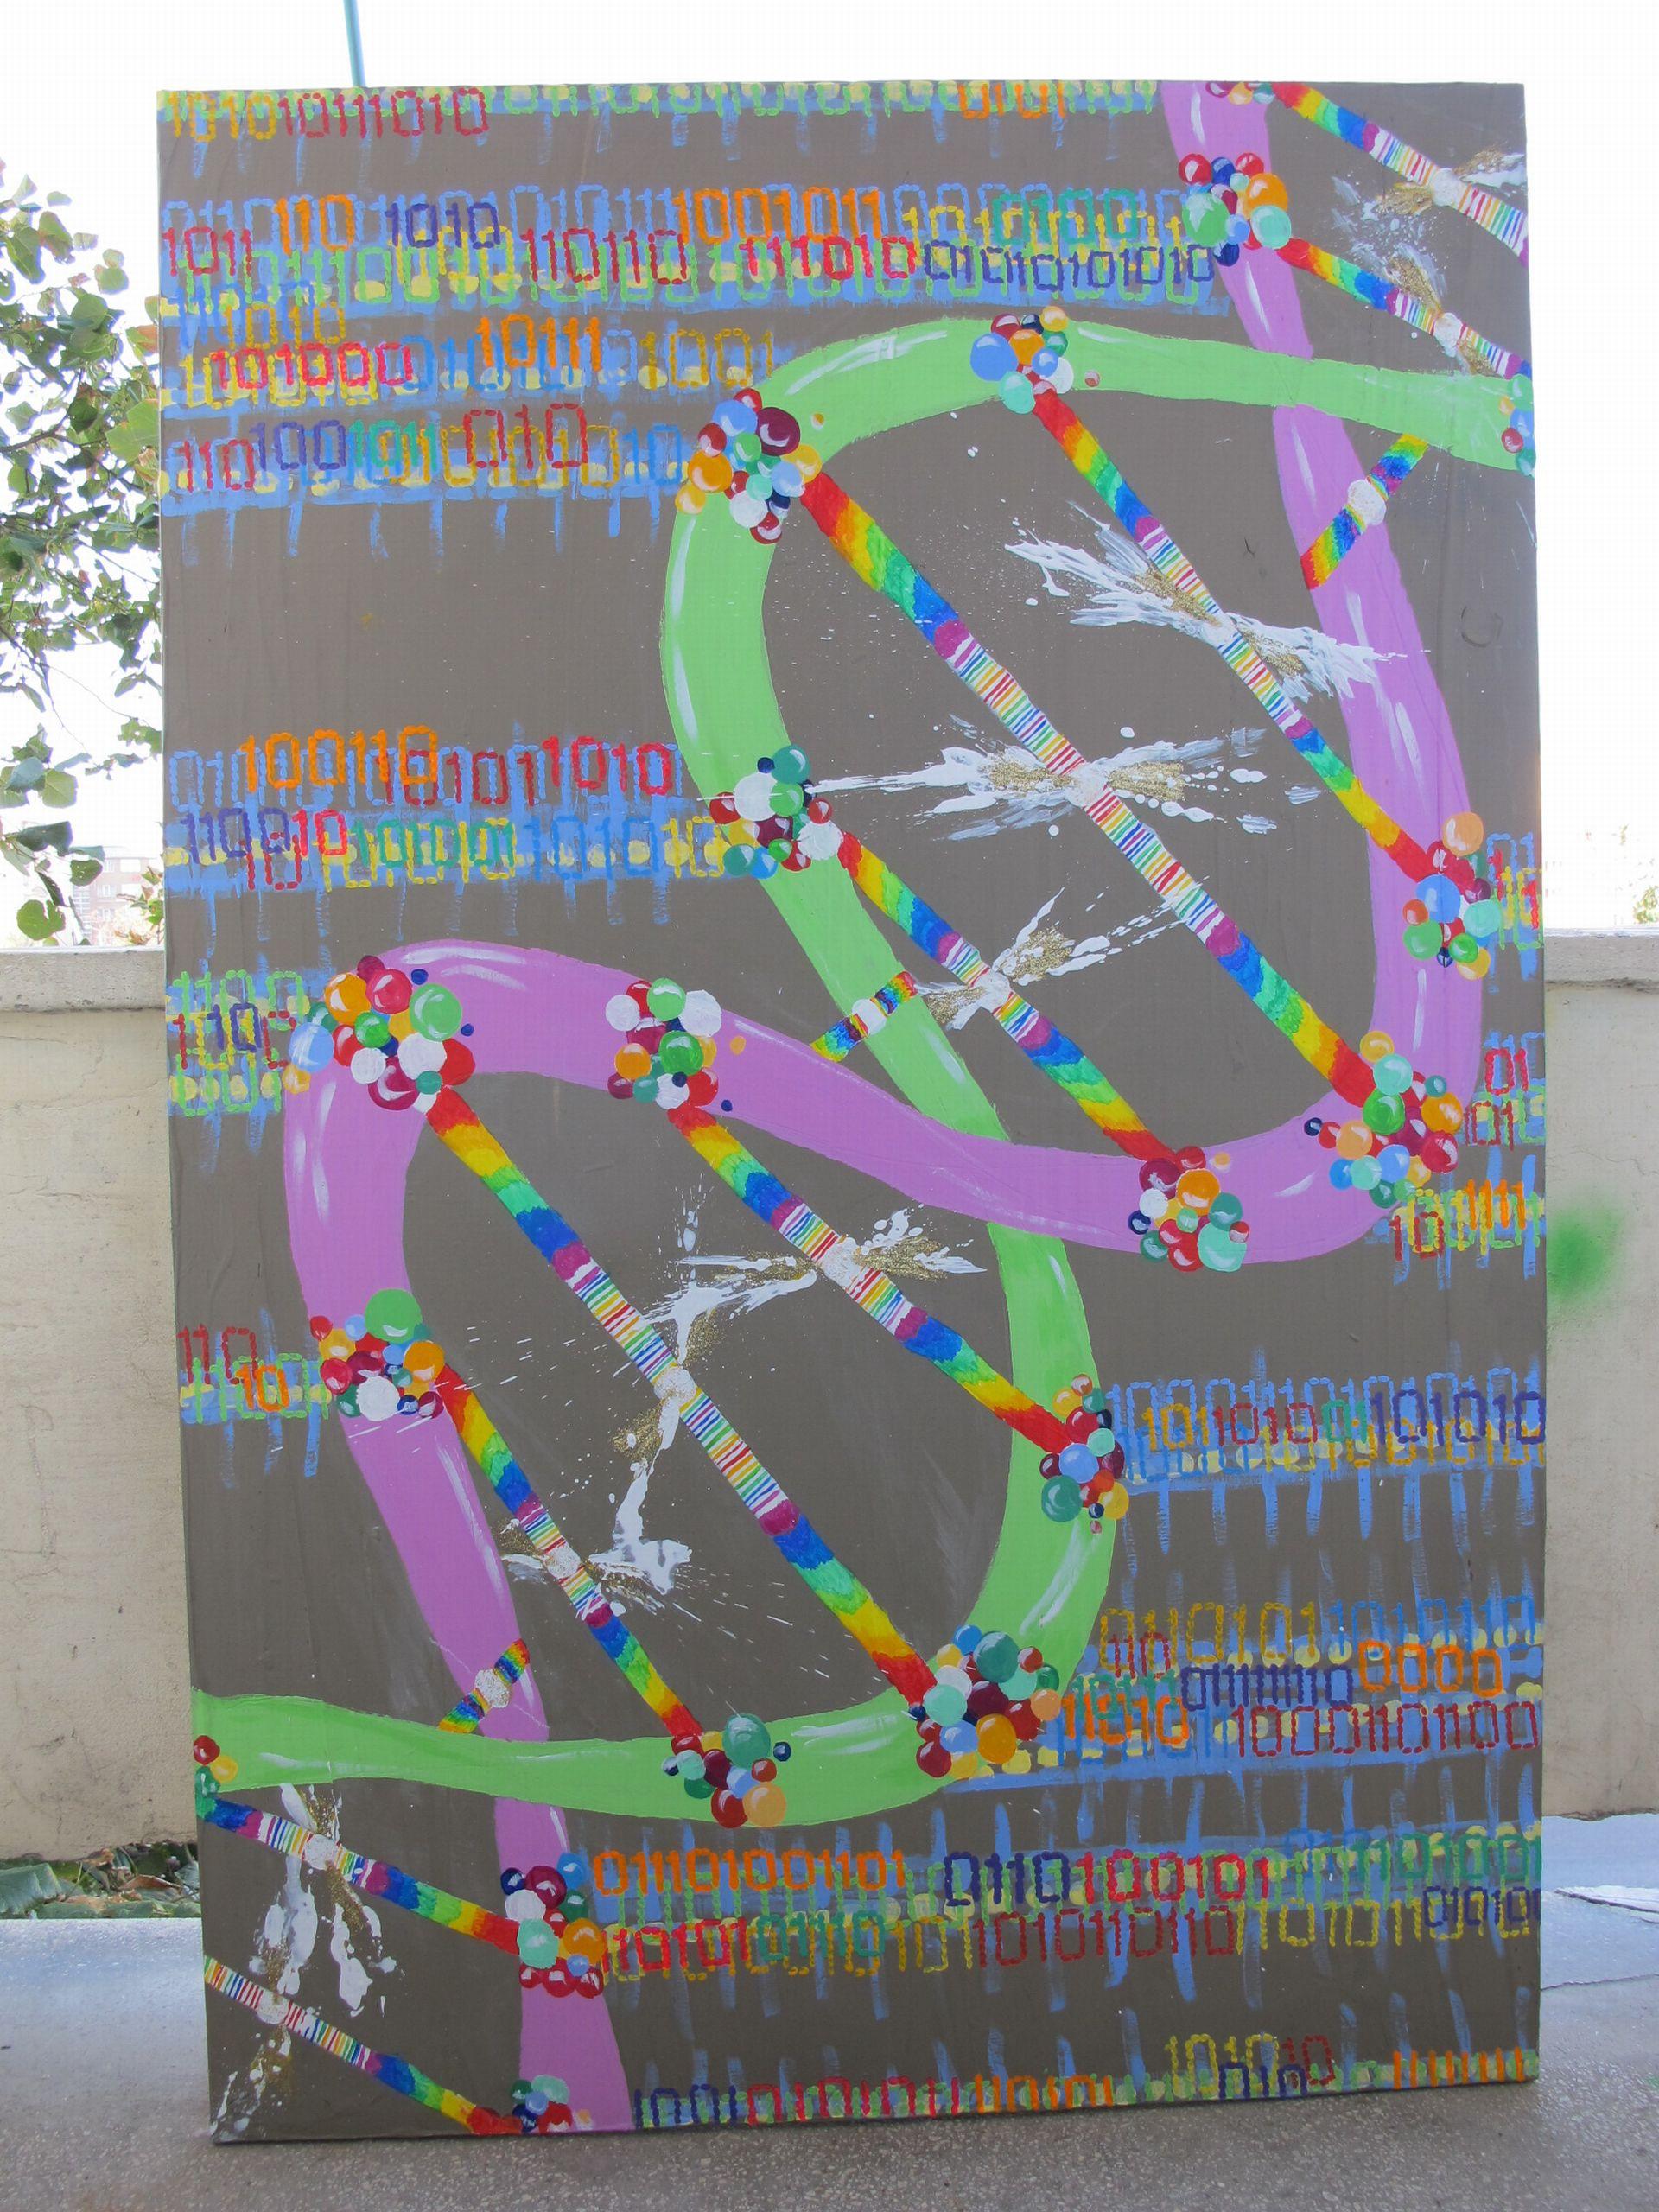 Injecting information, 2012, Adela Parvu